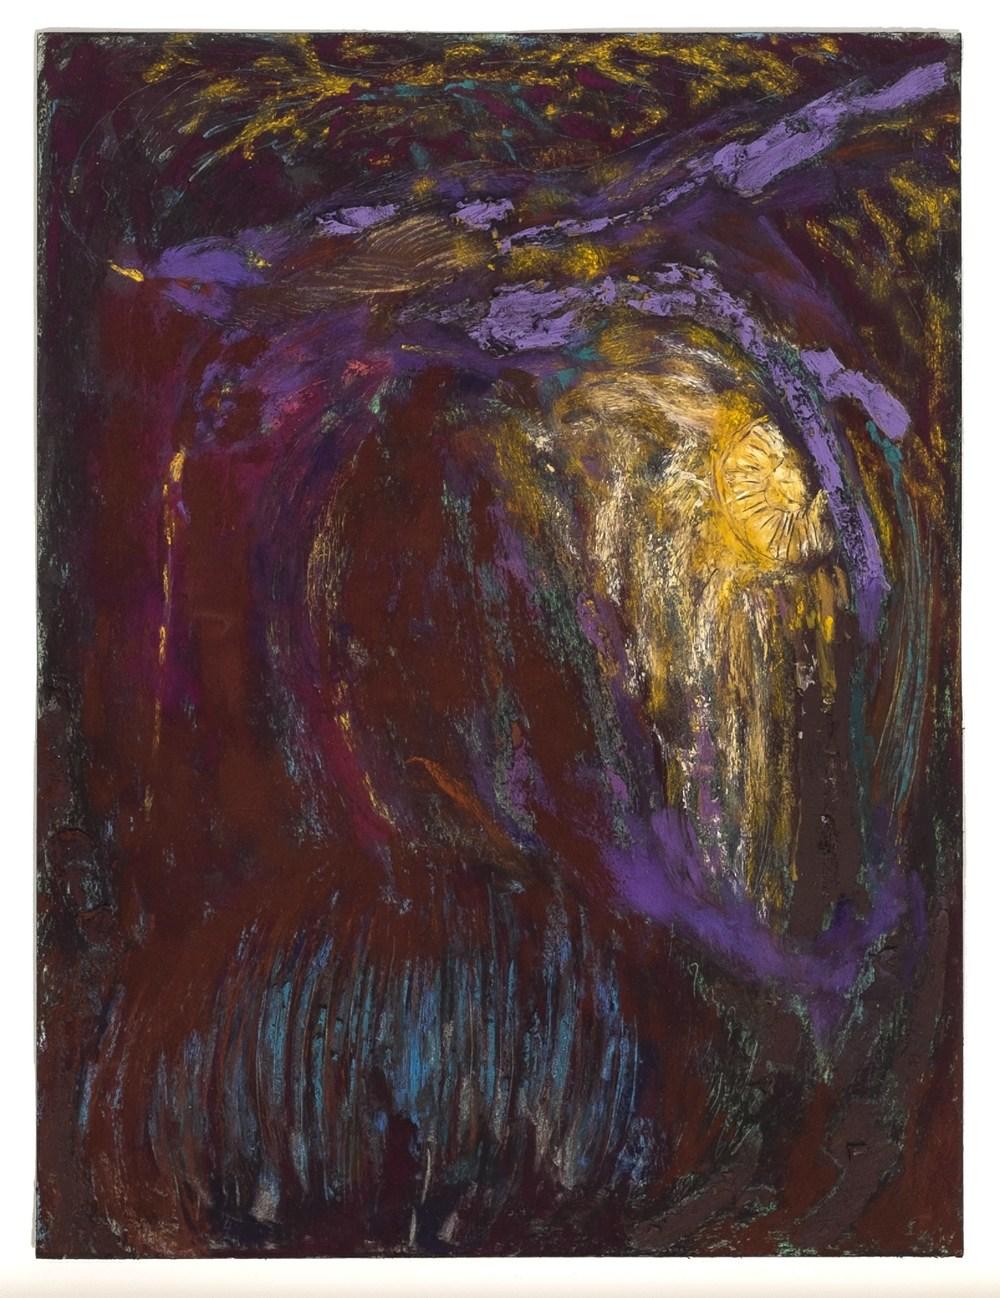 Mimi Lauter  Lovebirds (Miniature)  2014 Soft pastel, oil pastel on paper 15 ½h x 12w in (artwork); 20h x 16w in (framed) MLaut047